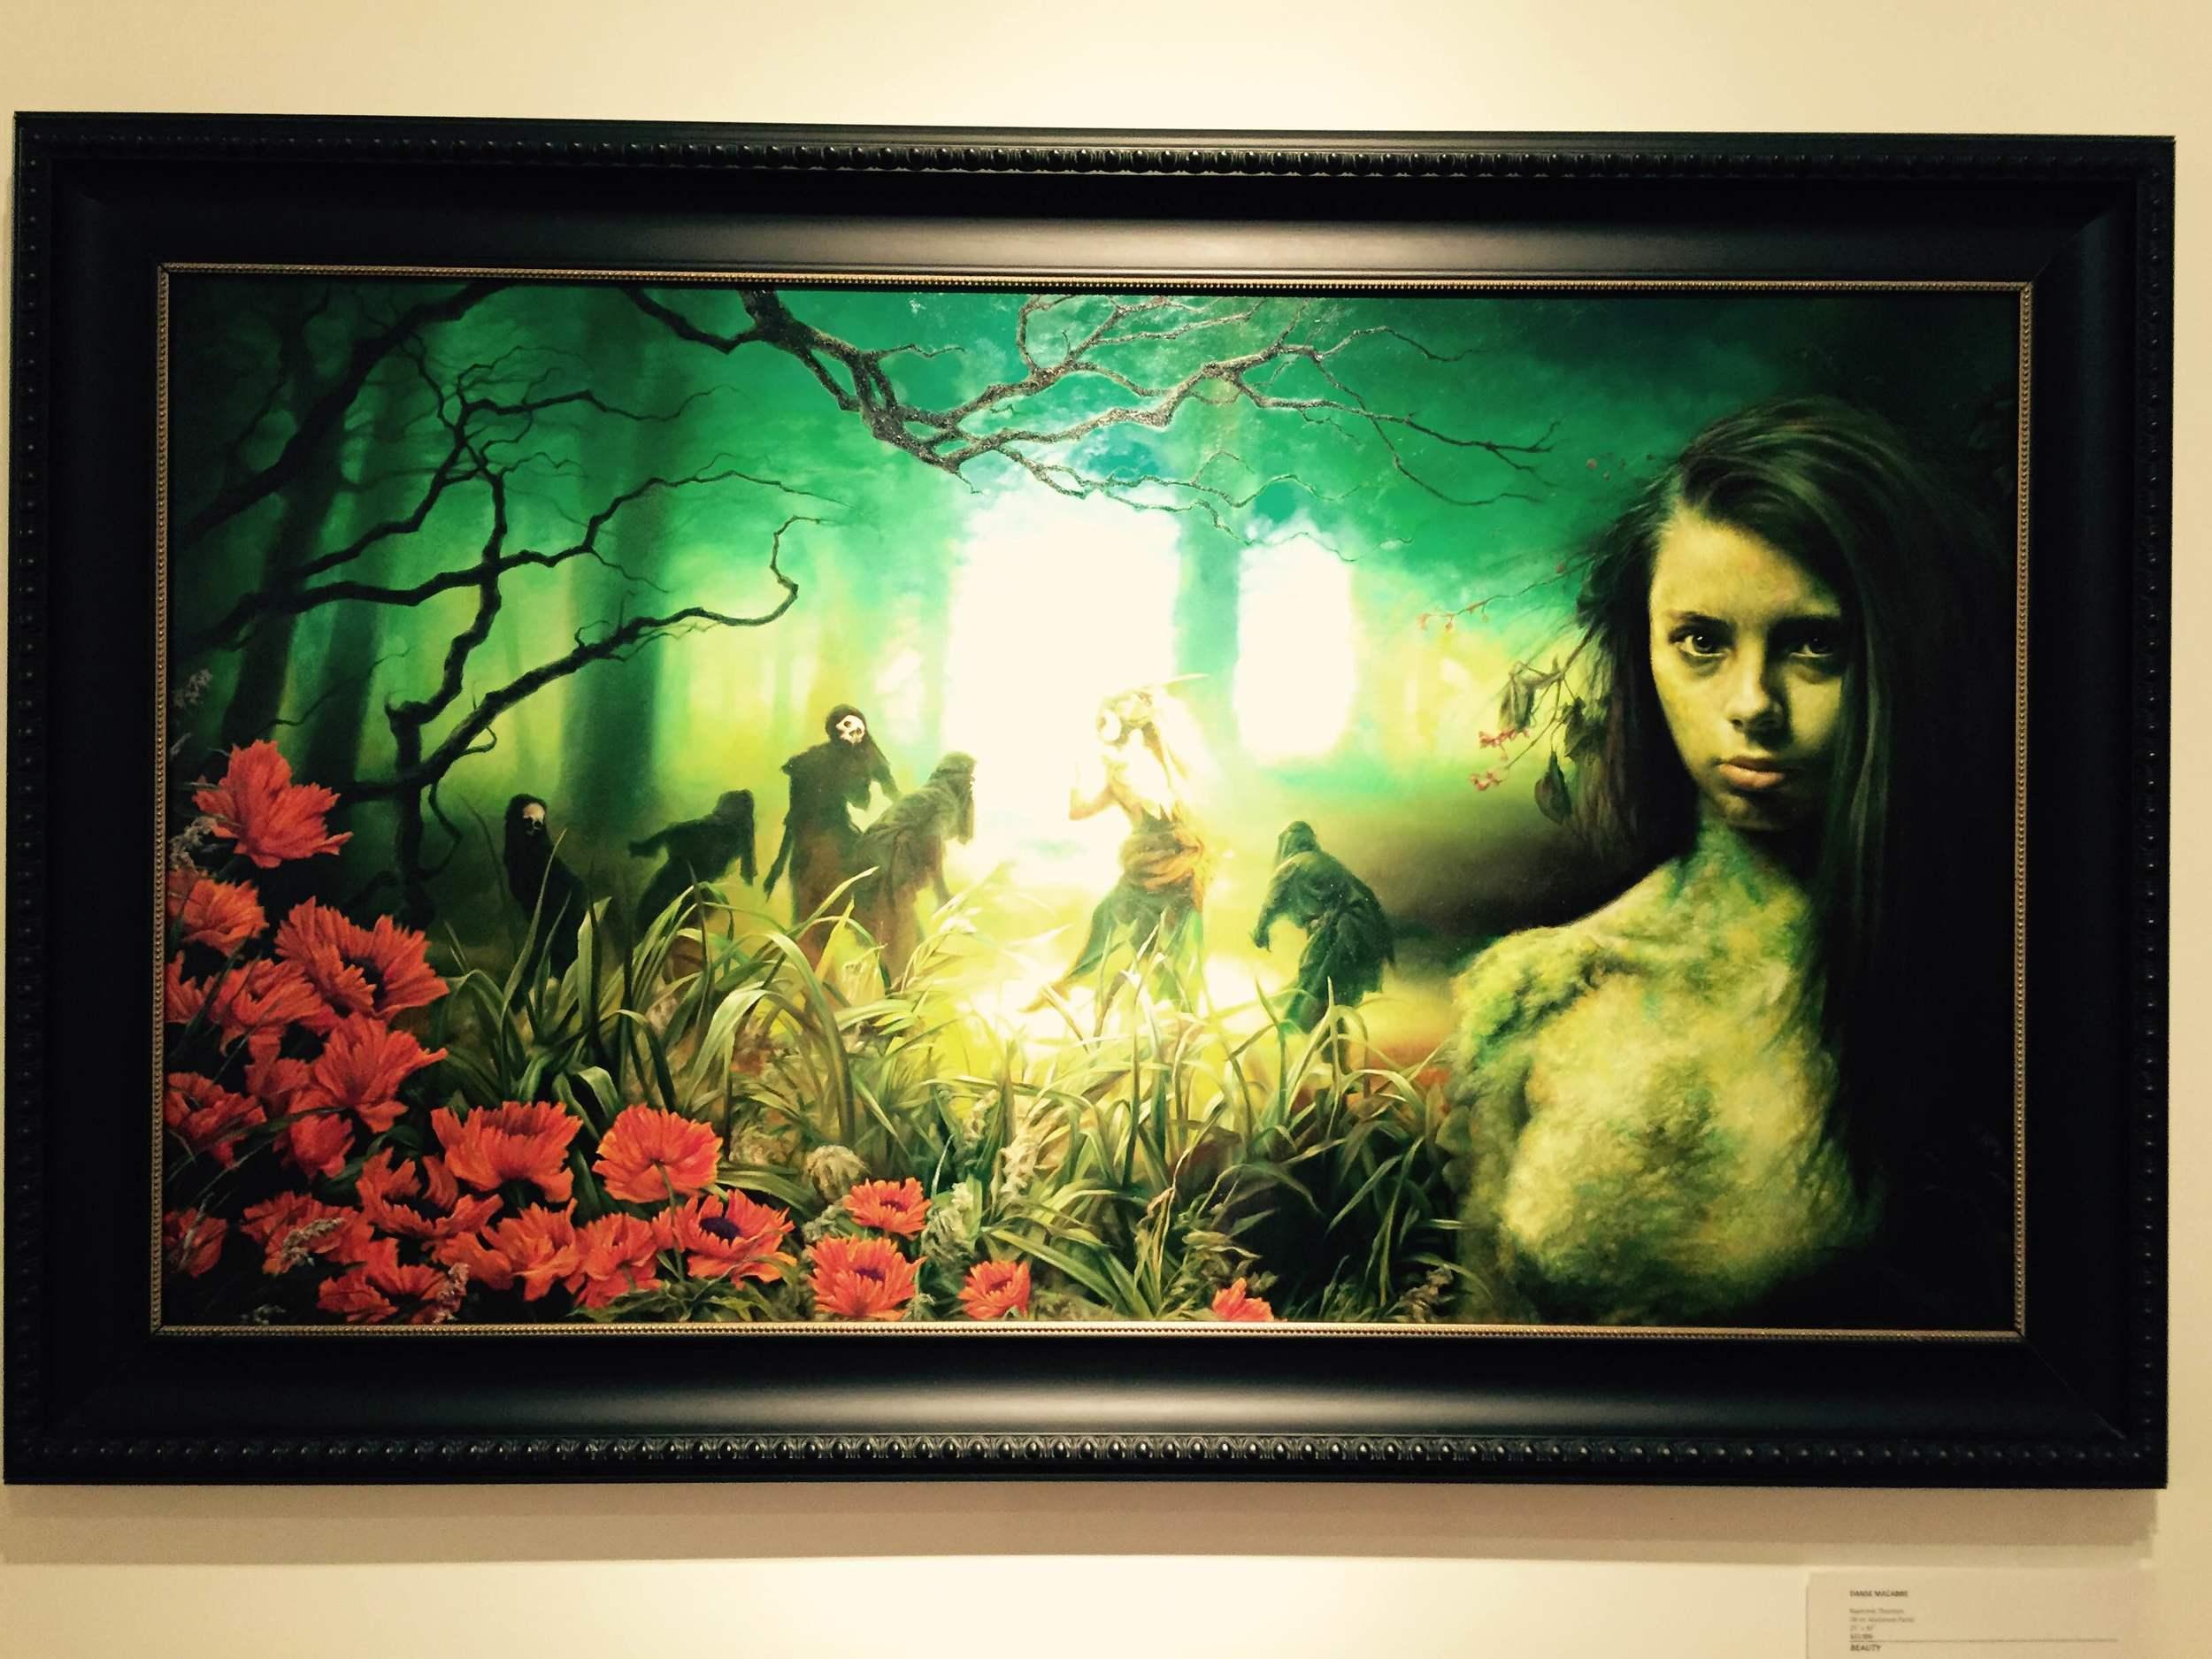 "Danse Macabre  Raymond Thornton Oil on Aluminum Panel 25"" x 44"" http://www.raymondthornton.com/"